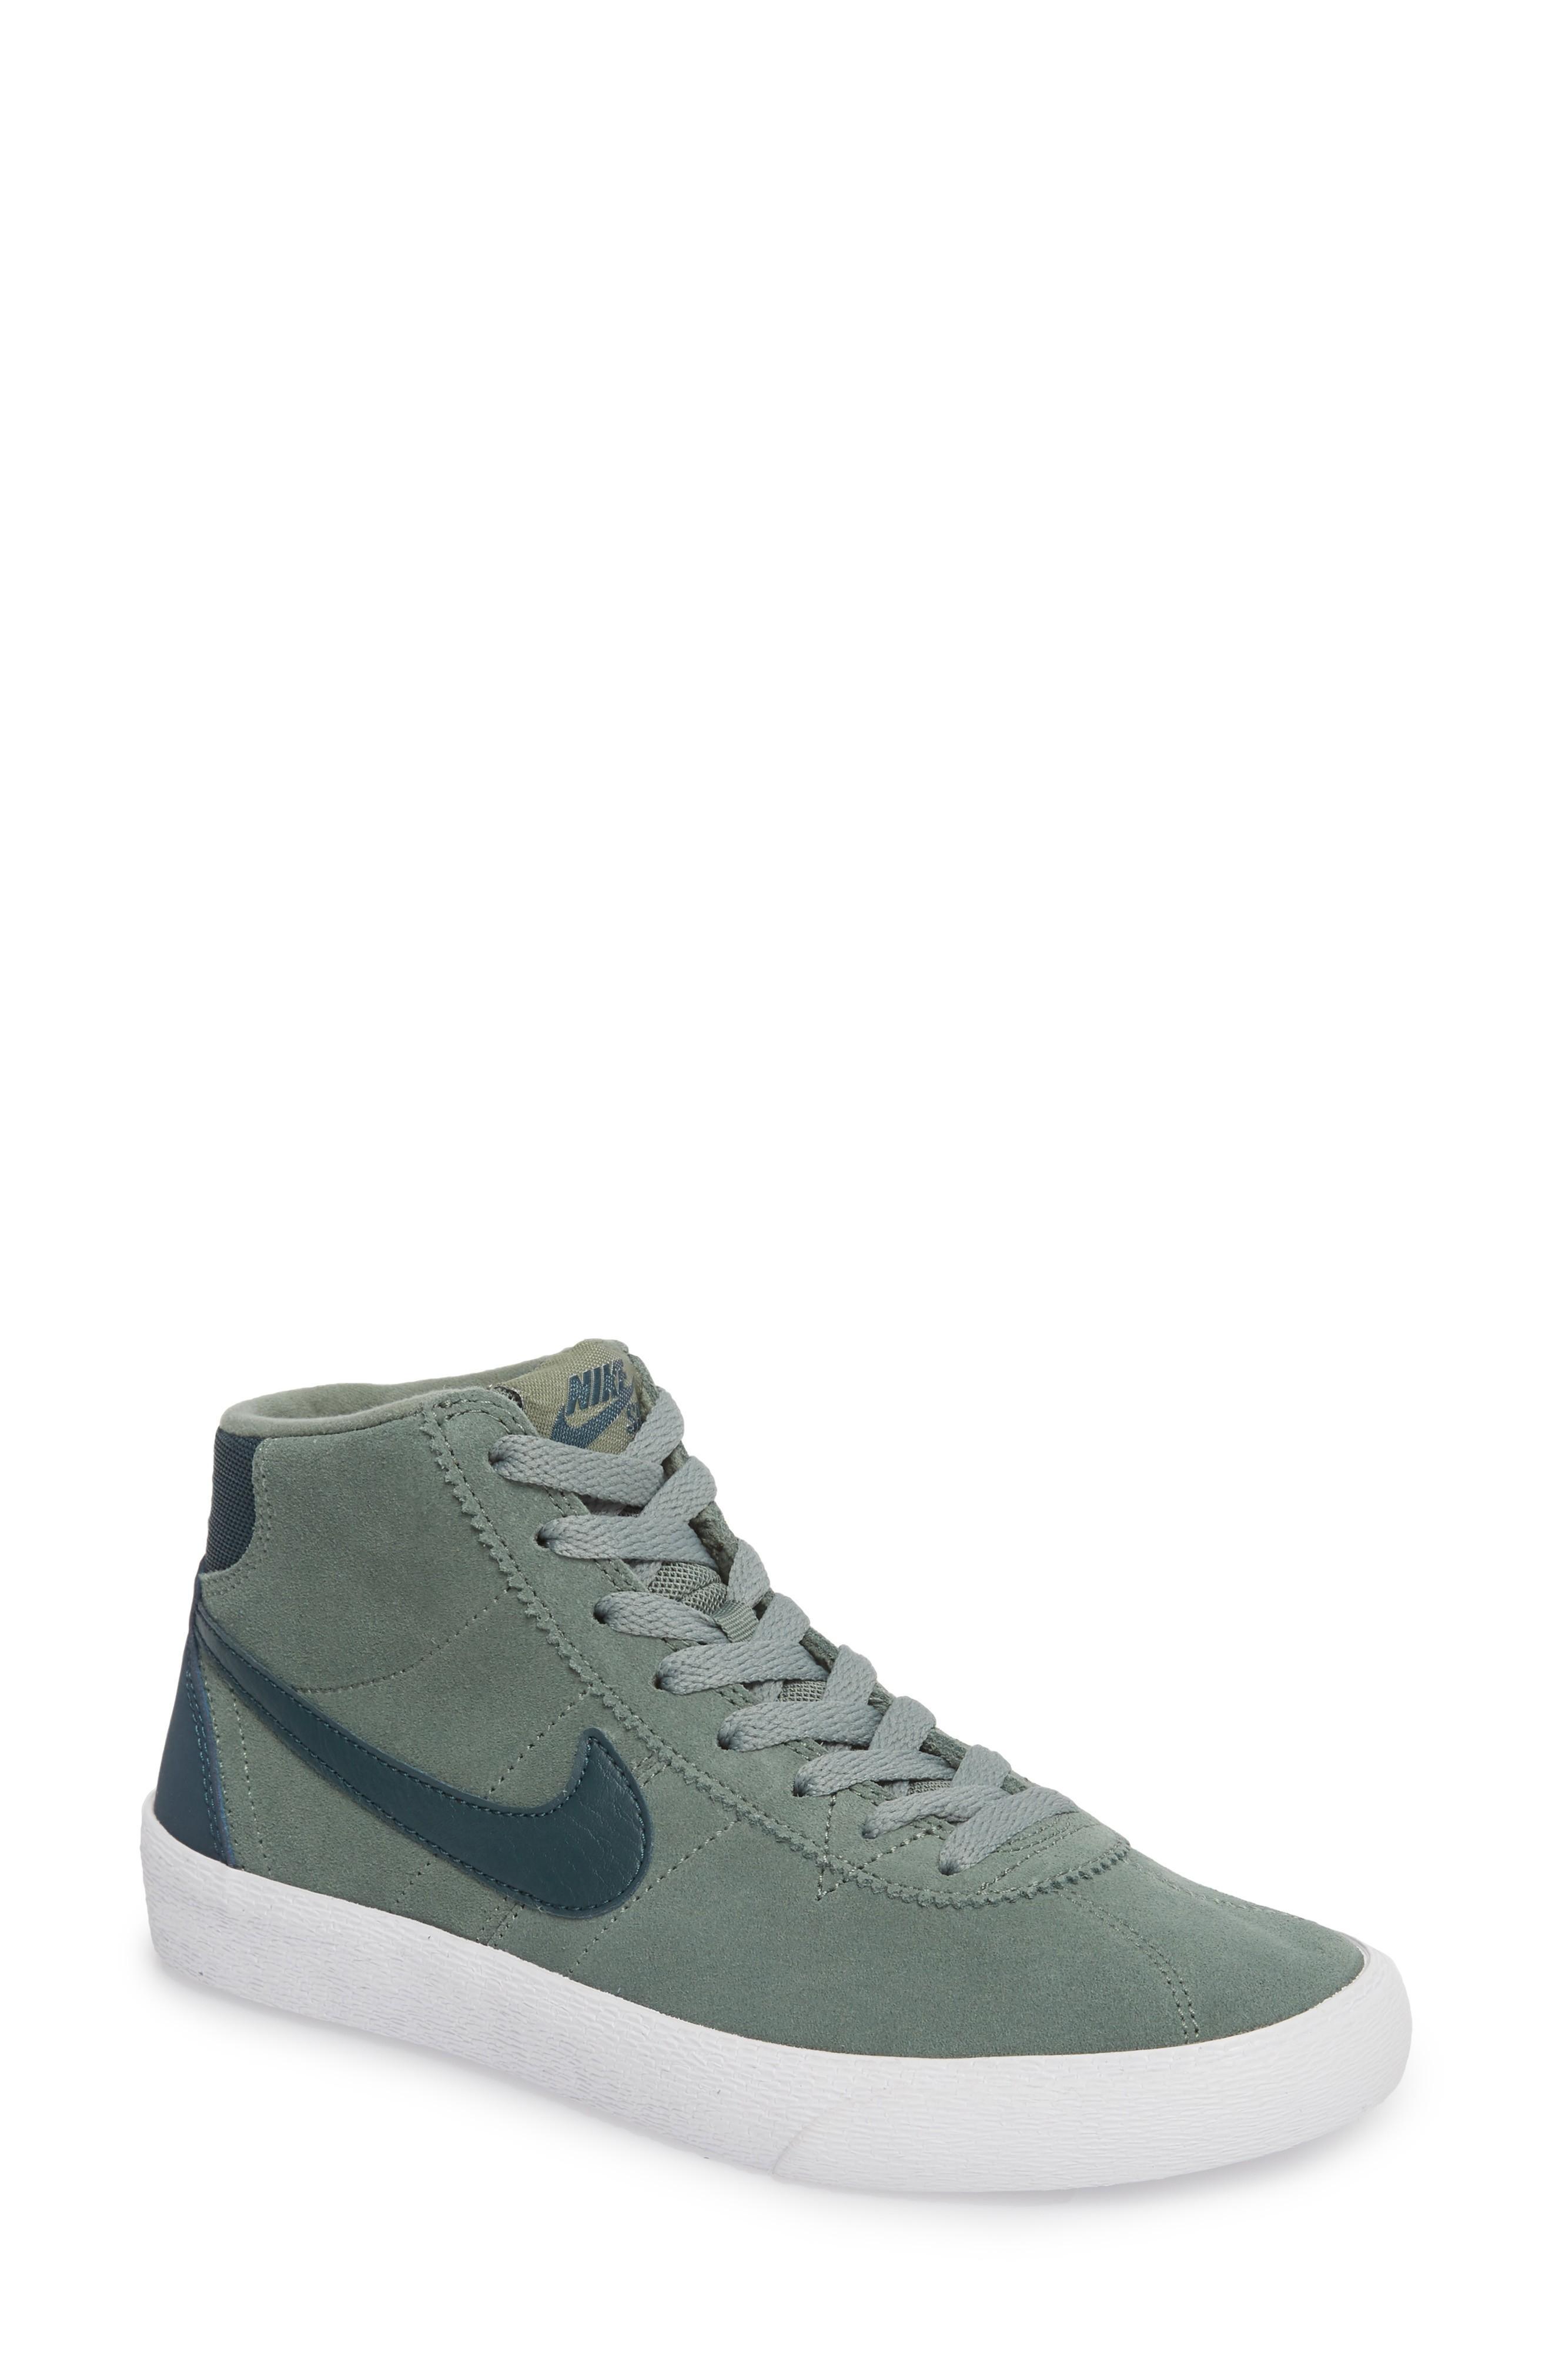 Nike Sb Bruin Hi Skateboarding Sneaker In Clay Green/ Deep Jungle